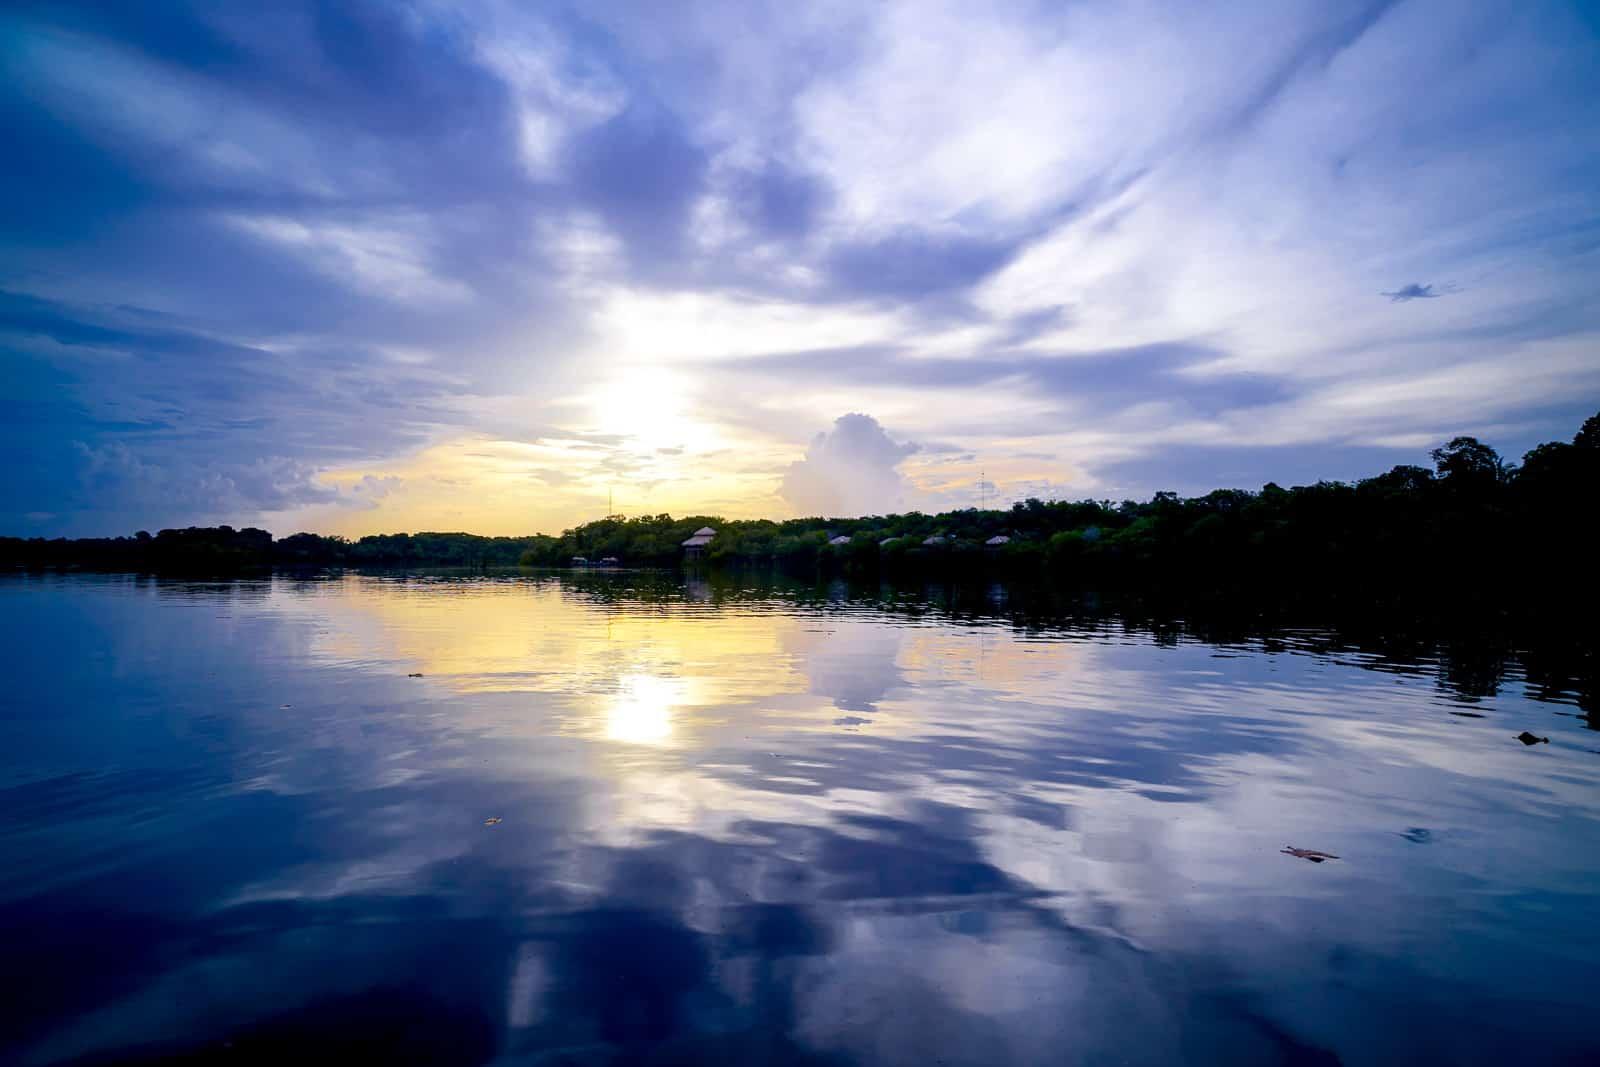 Brazil - Amazon Juma Lodge Canoe Trip